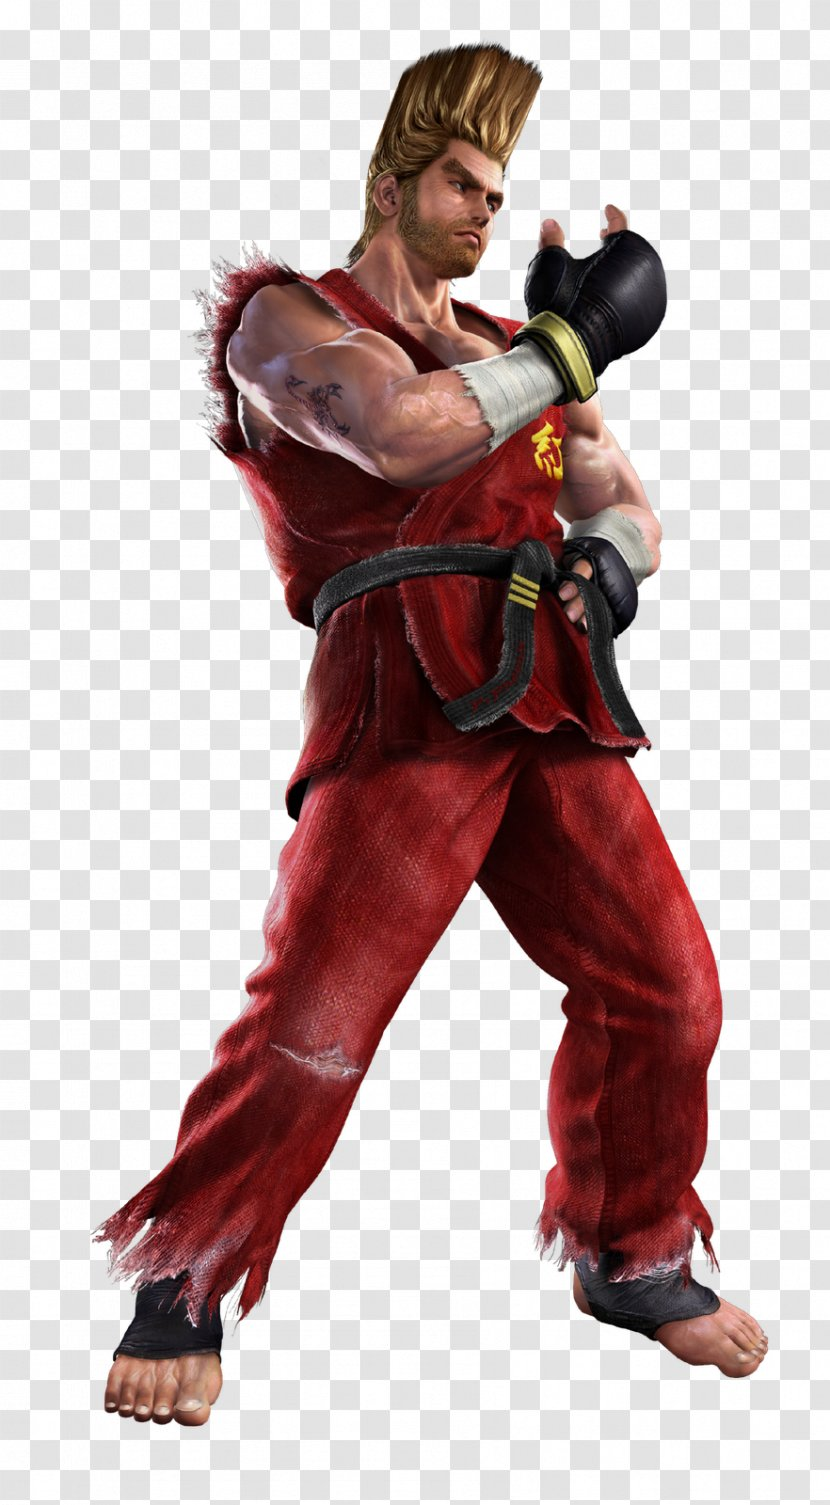 Tekken 6 Bloodline Rebellion 5 3 Nina Williams 6 King Transparent Png